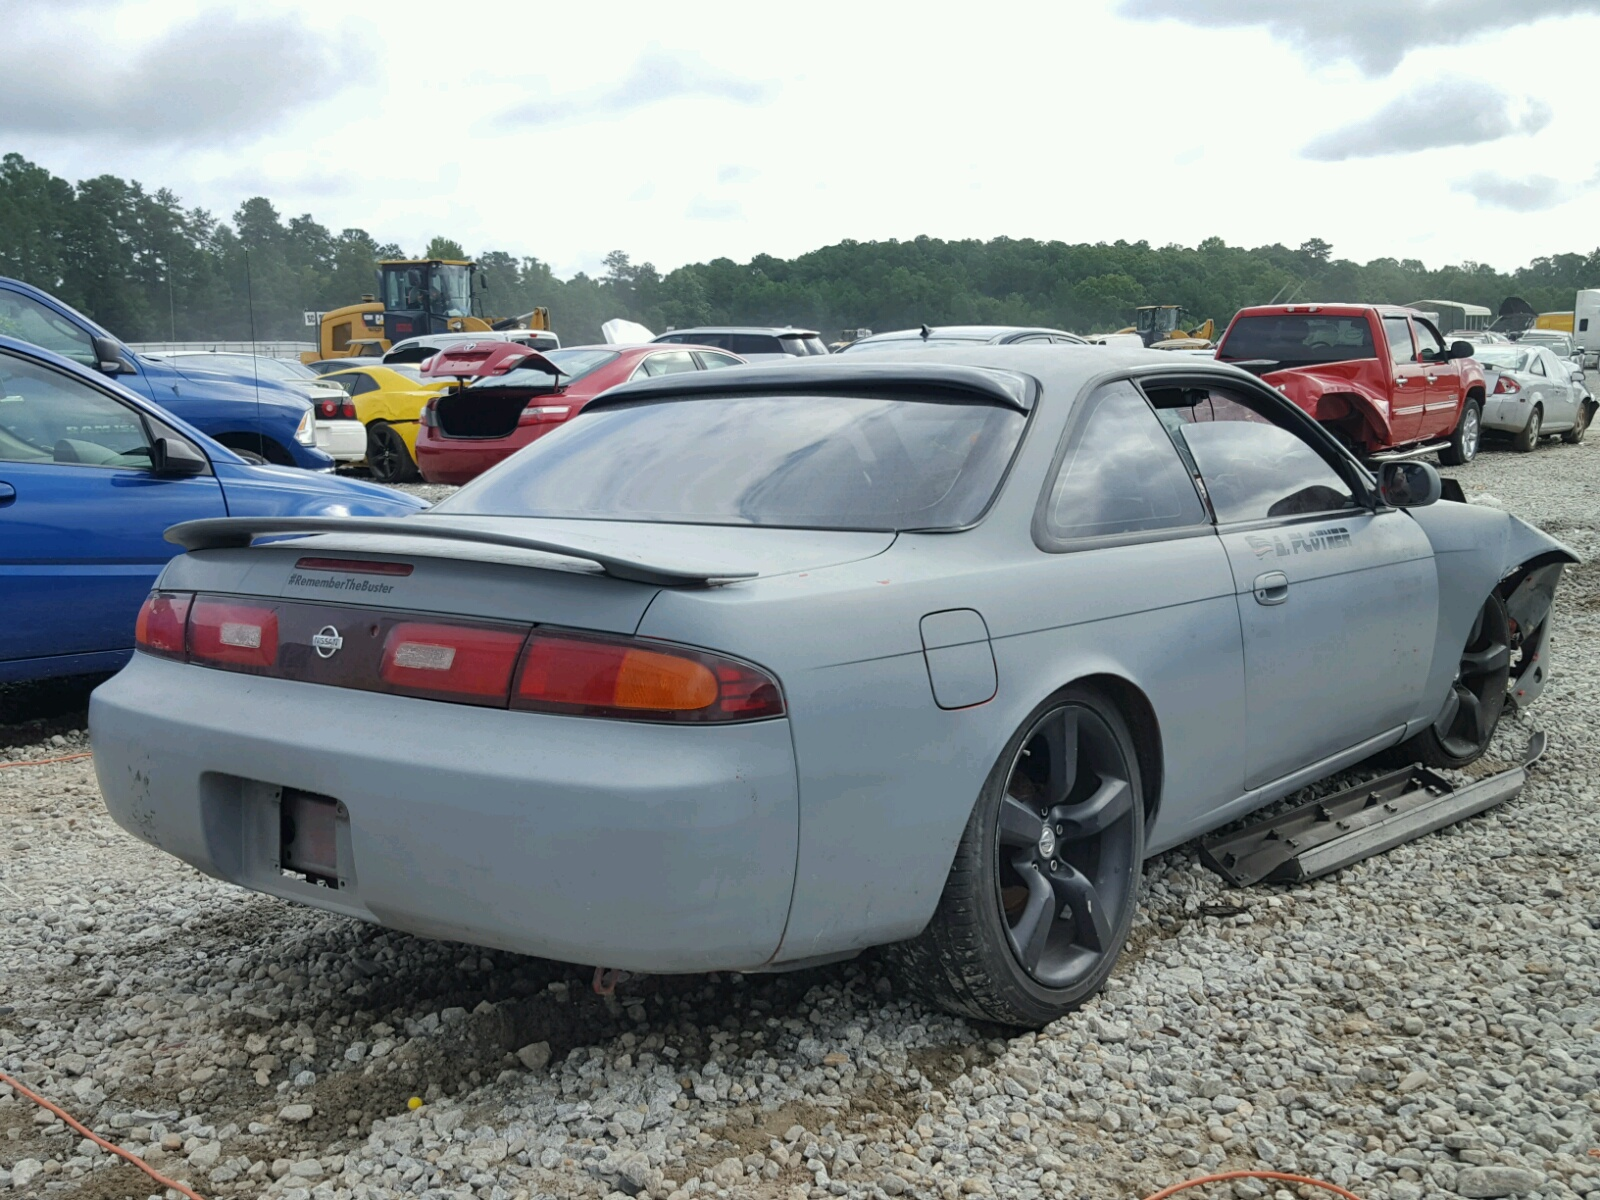 1995 Nissan 240sx Base For Sale At Copart Ellenwood Ga Lot 43490598 1998